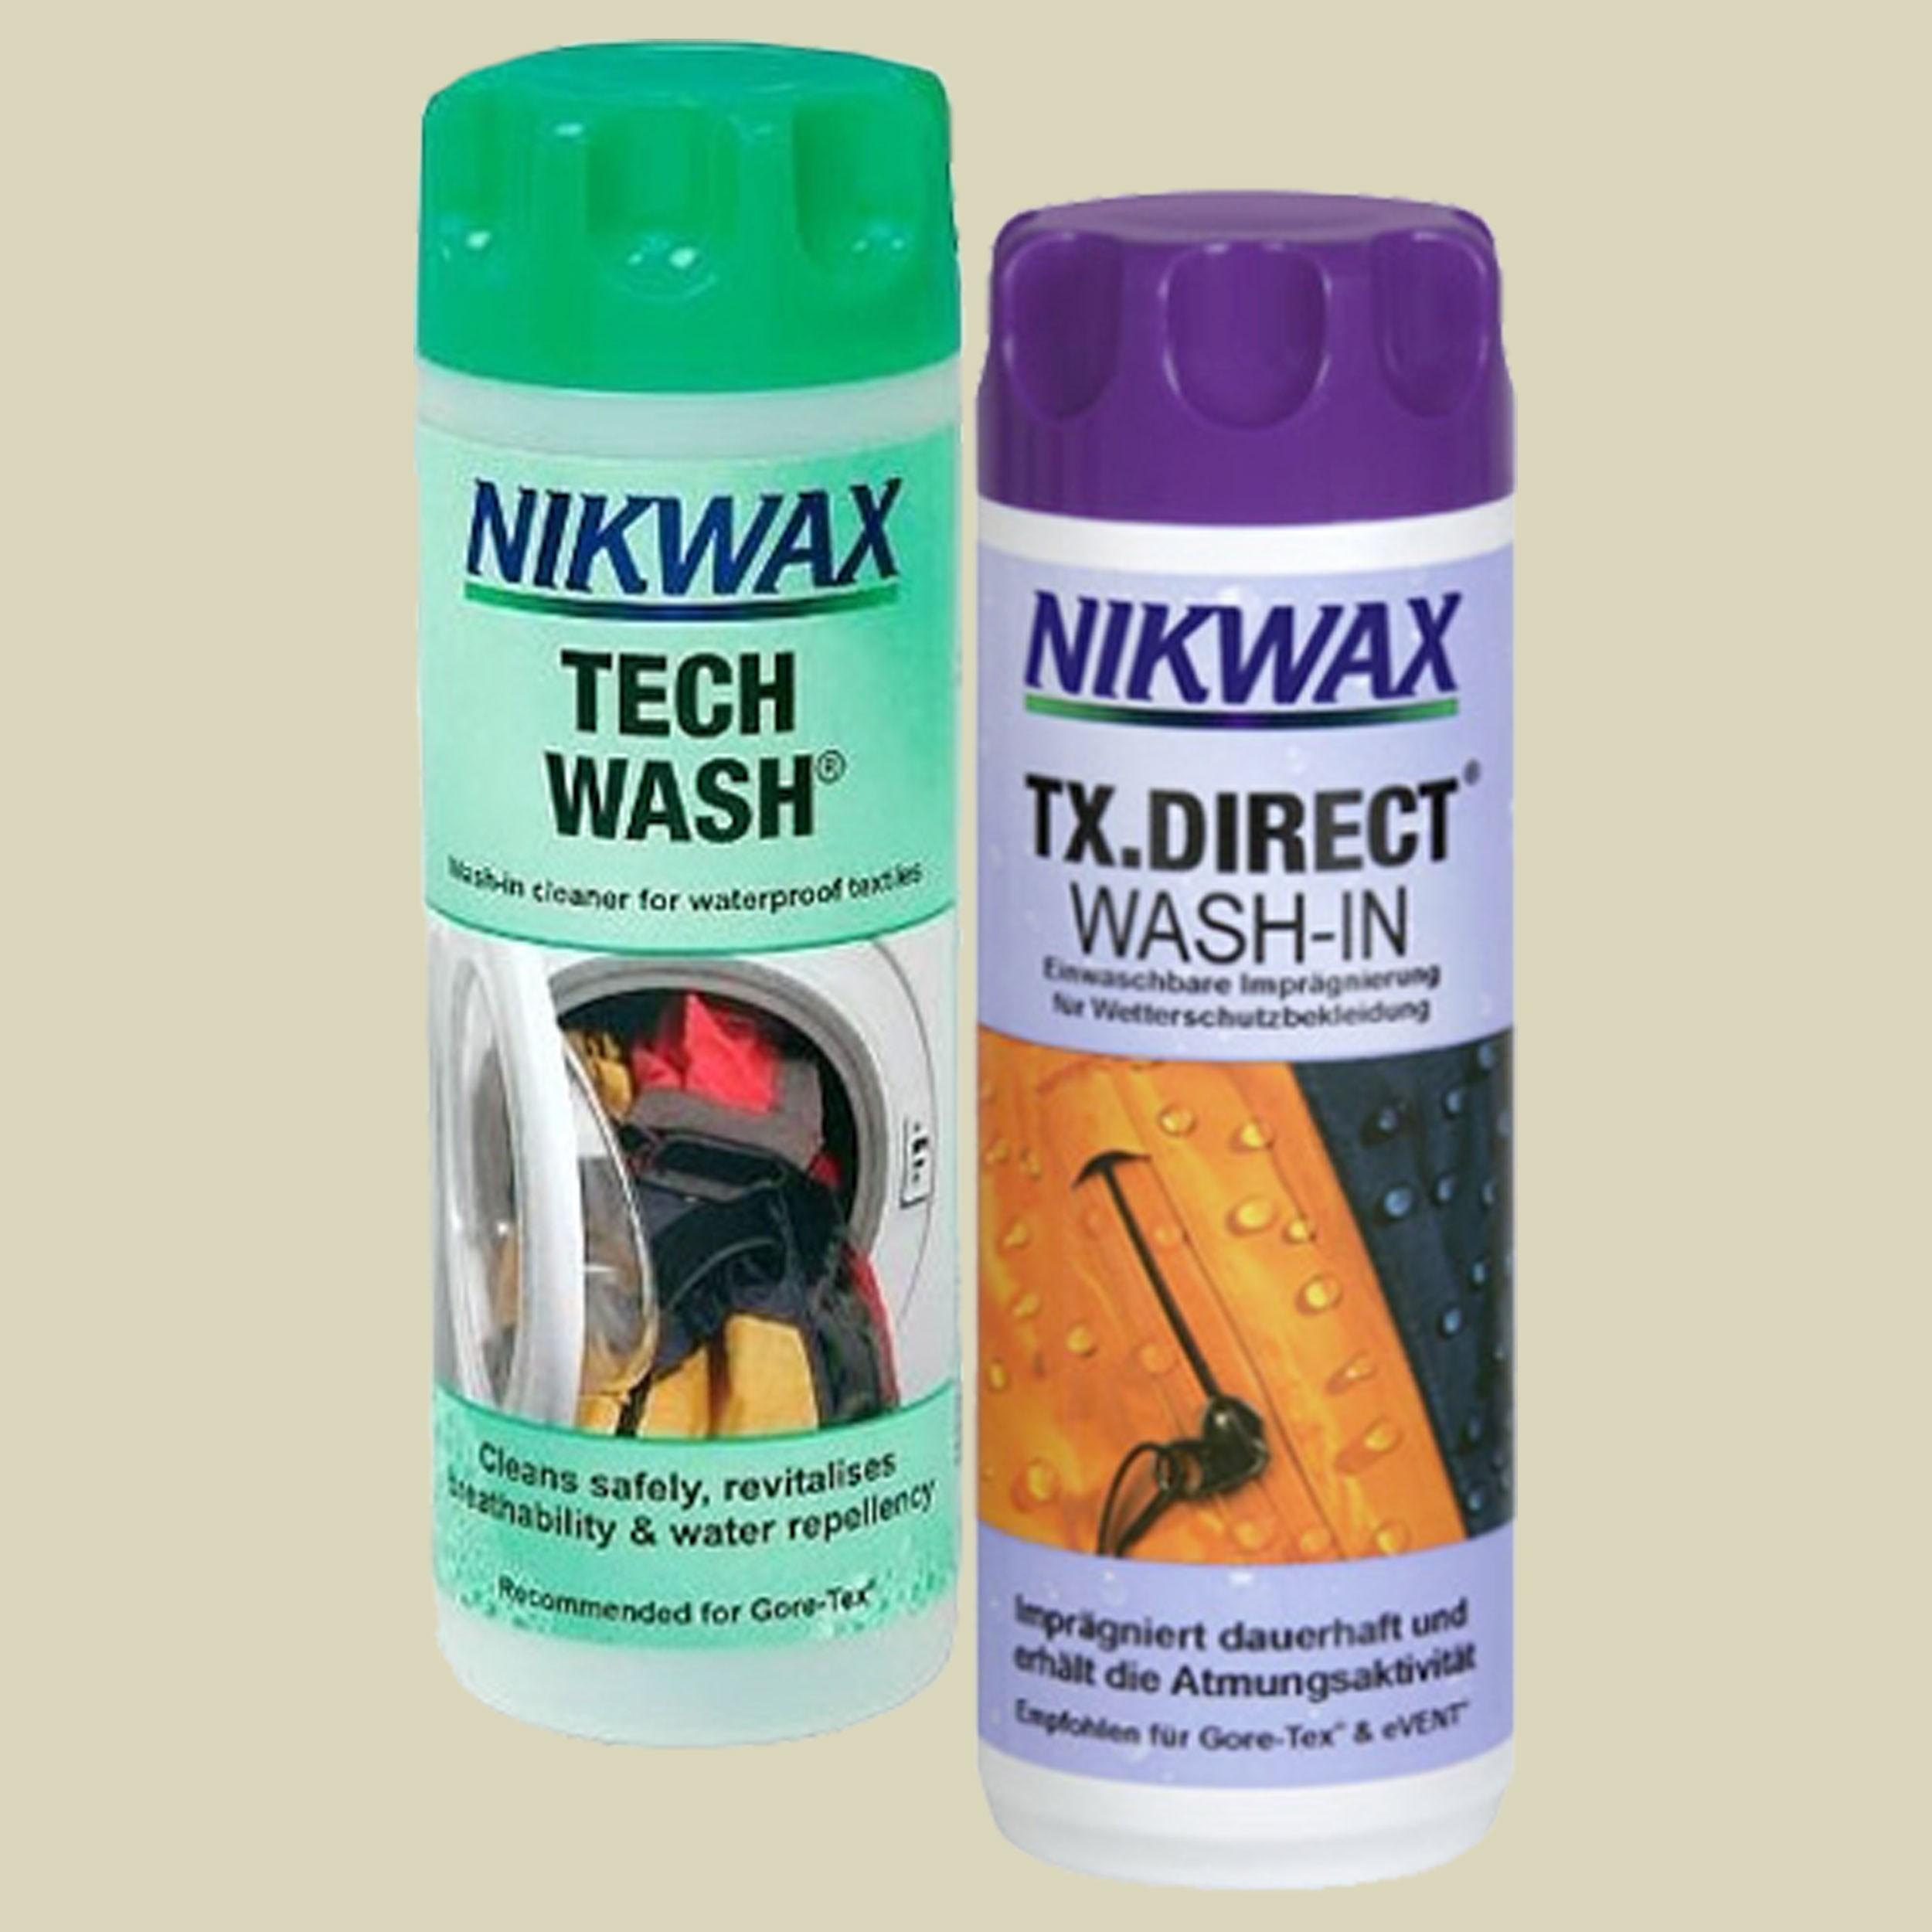 nikwax_twin_tech_wash_direct_wash_model_0103_fallback